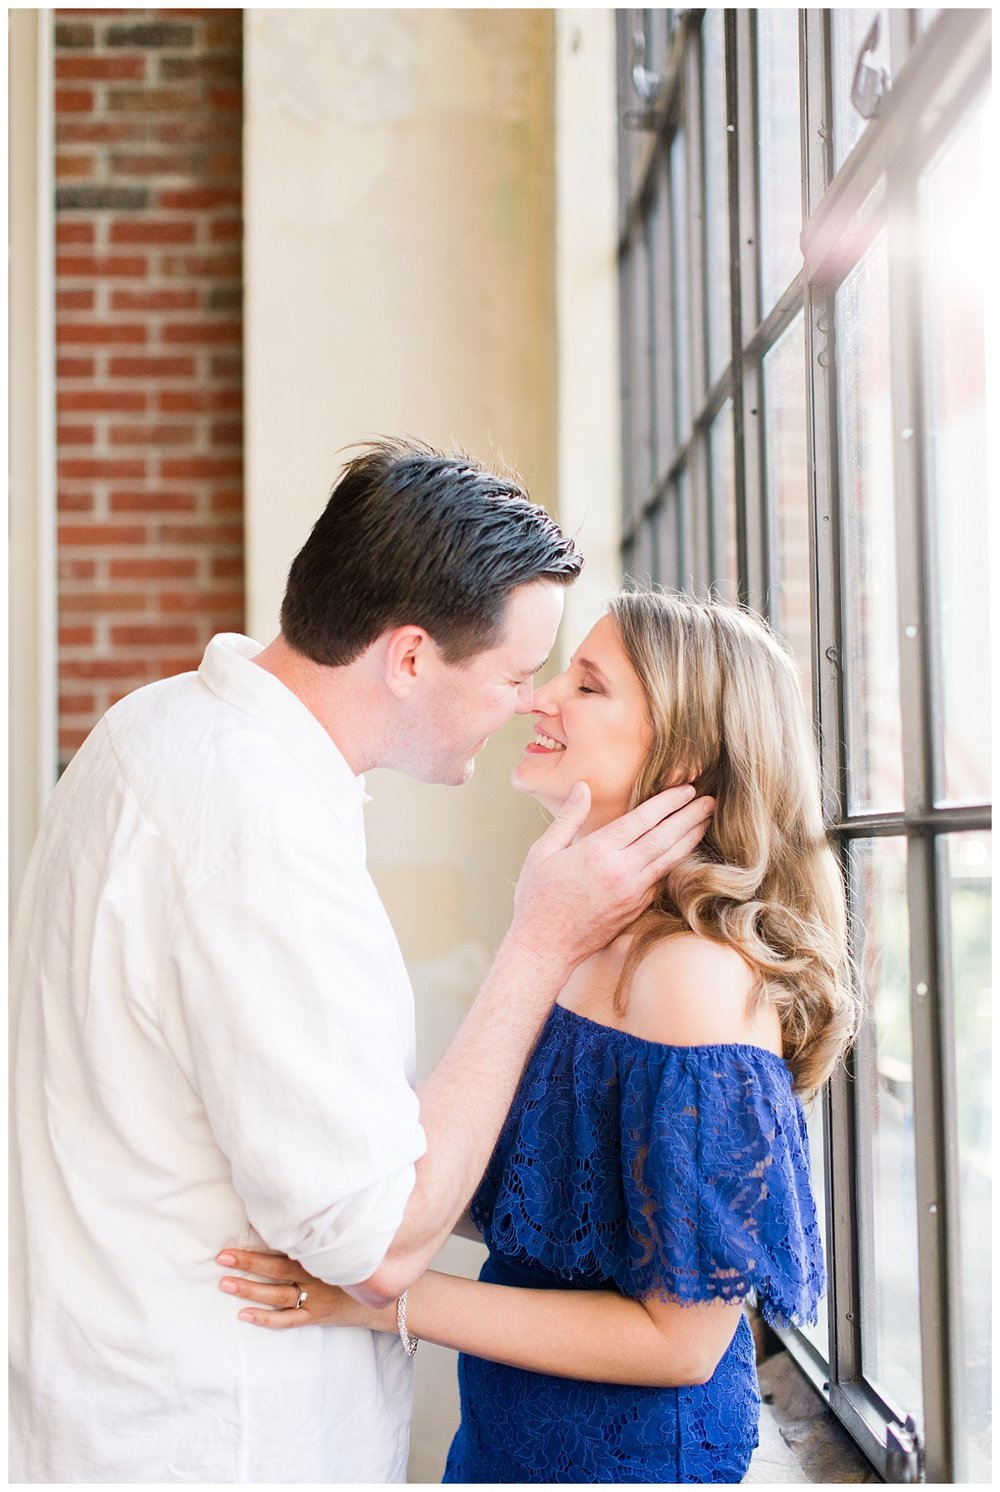 Engagement Pictures_KIm and Hamish_Abby Breaux Photography_Atlanta_Ponce City Market_Jackson Street Bridge_0016.jpg